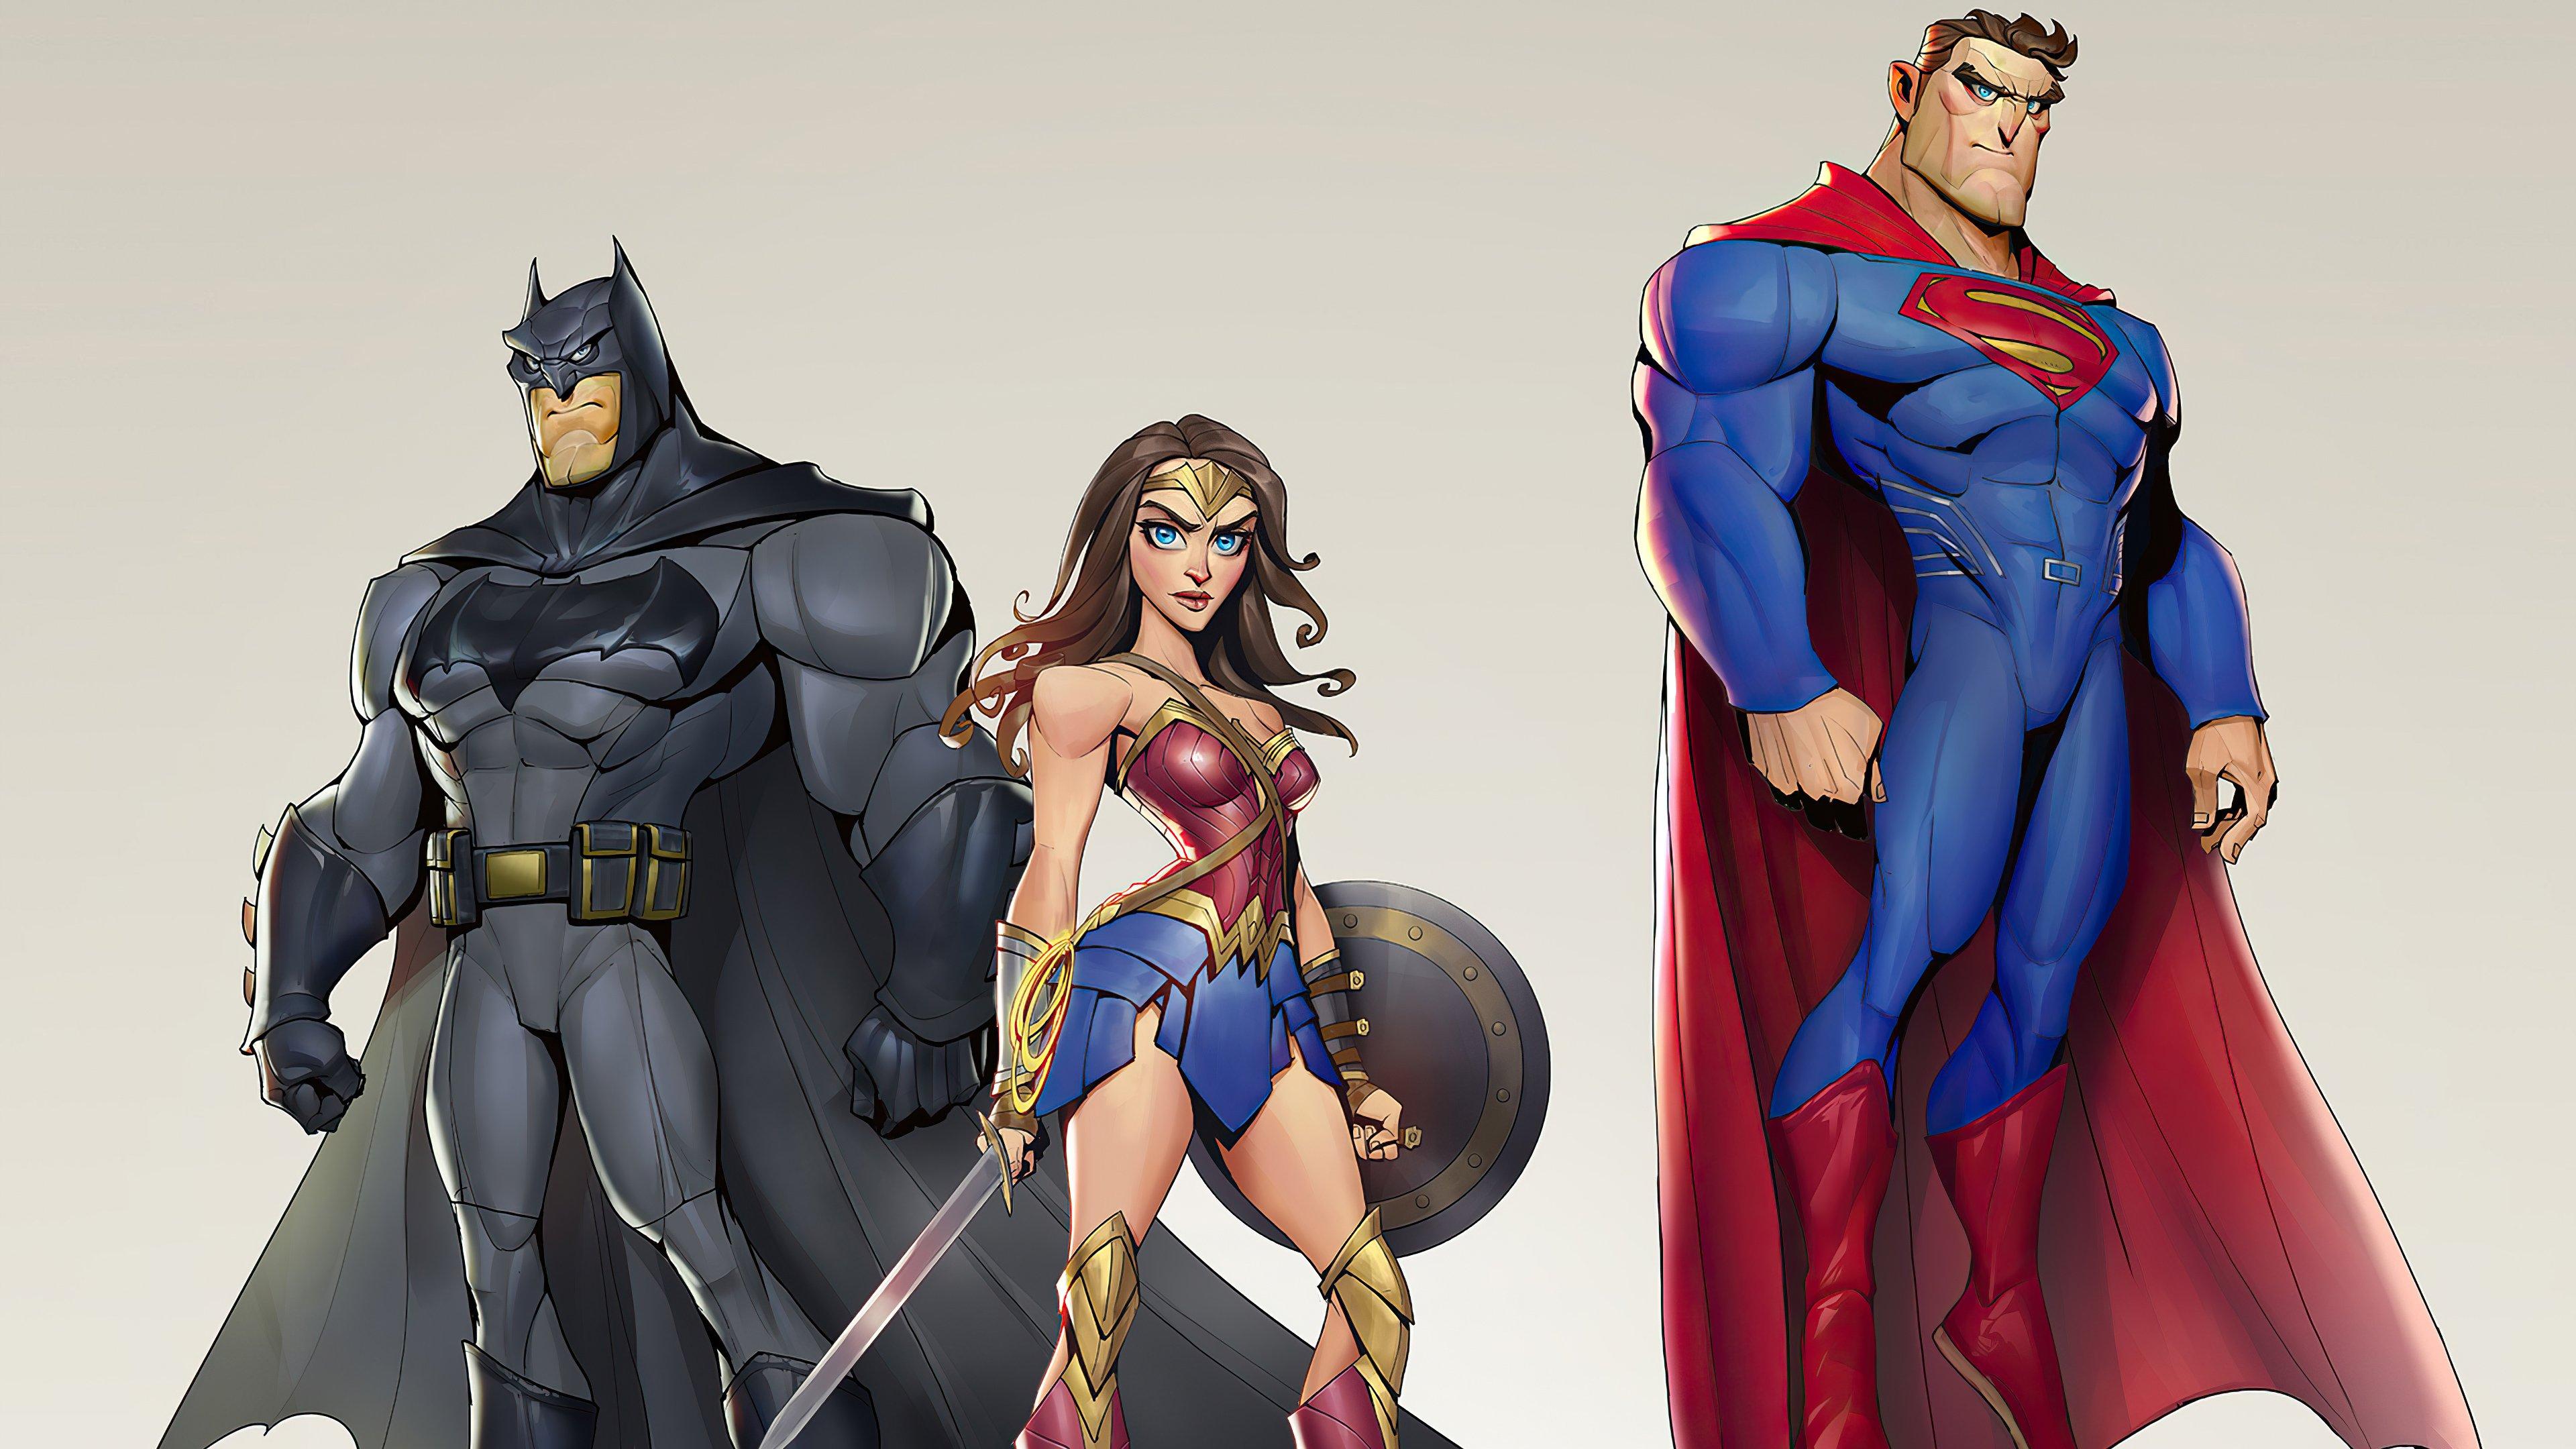 Fondos de pantalla Liga de la Justicia Caricatura